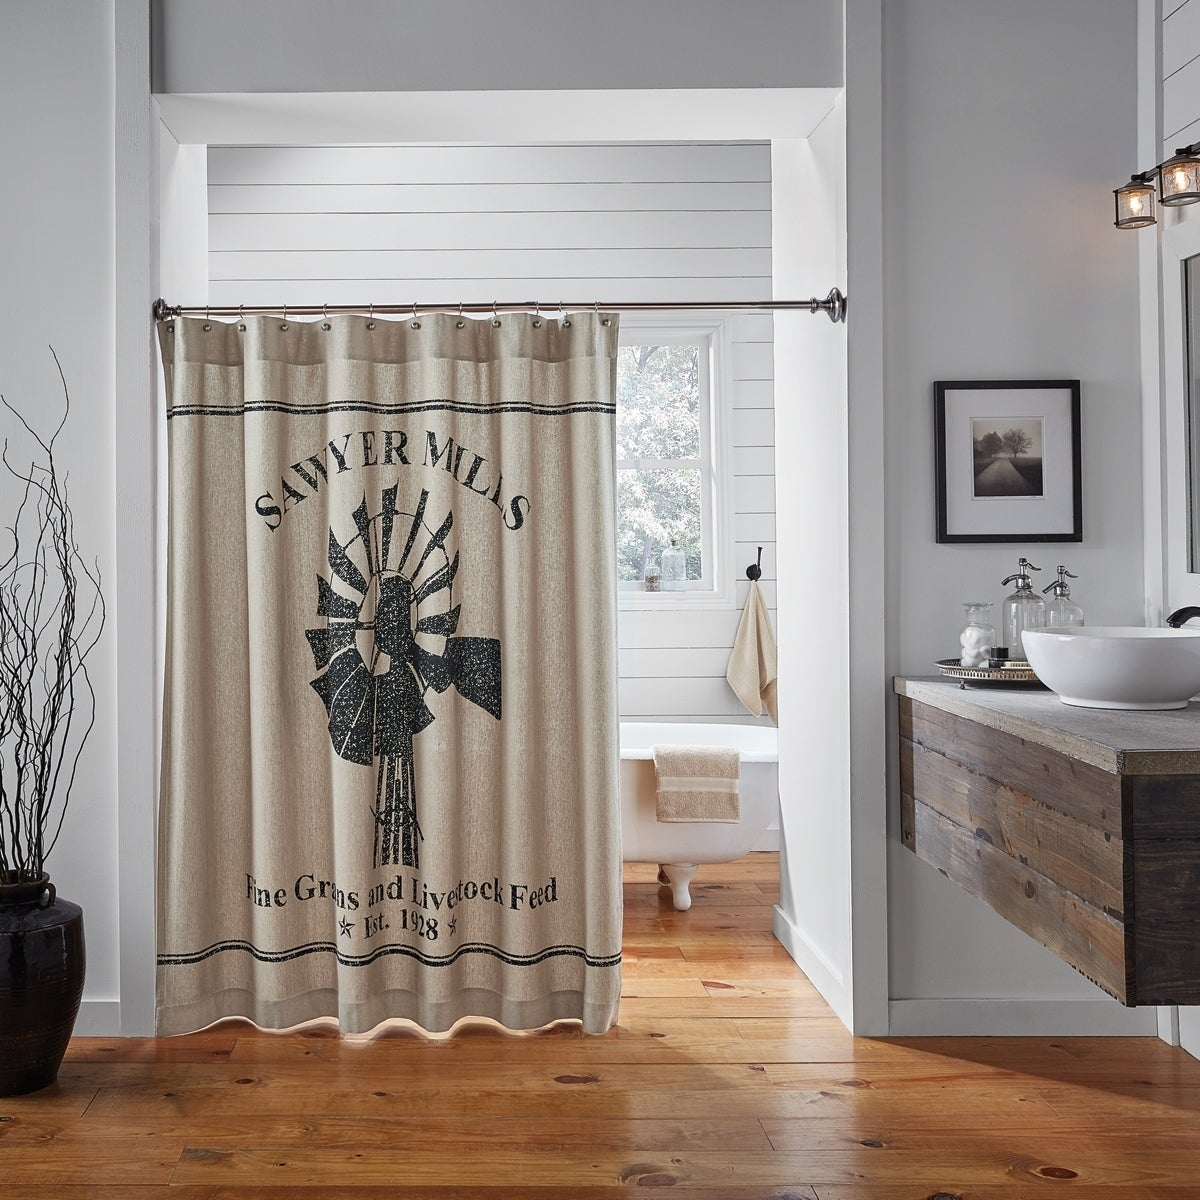 Details About Tan Farmhouse Bath Vhc Sawyer Mill Windmill Shower Curtain Asphalt Khaki Shower